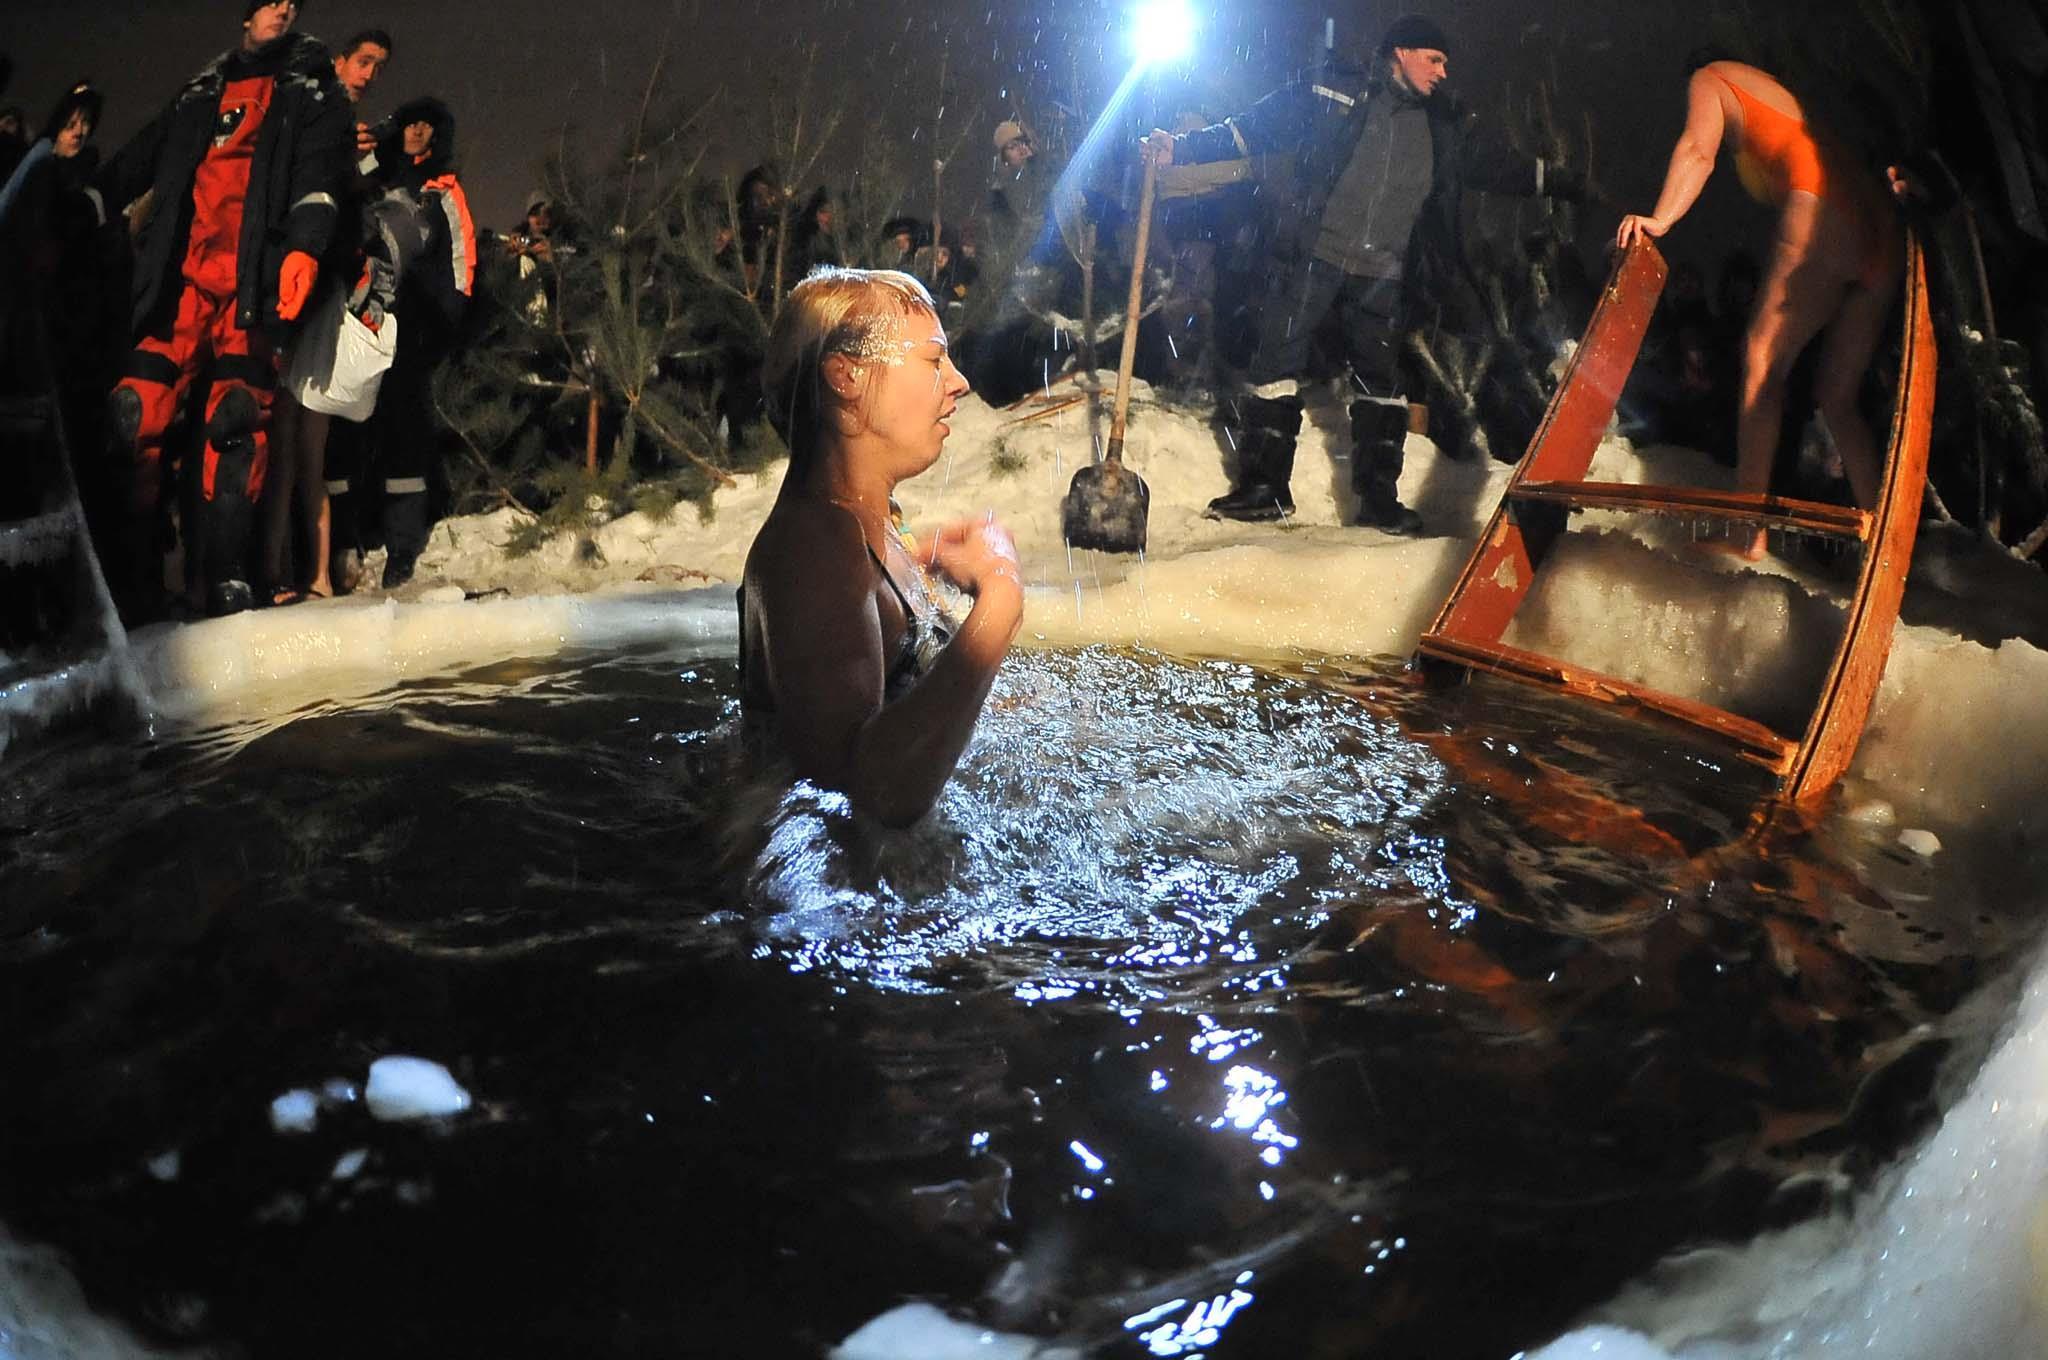 Опубликована программа крещенских купаний в Тольятти